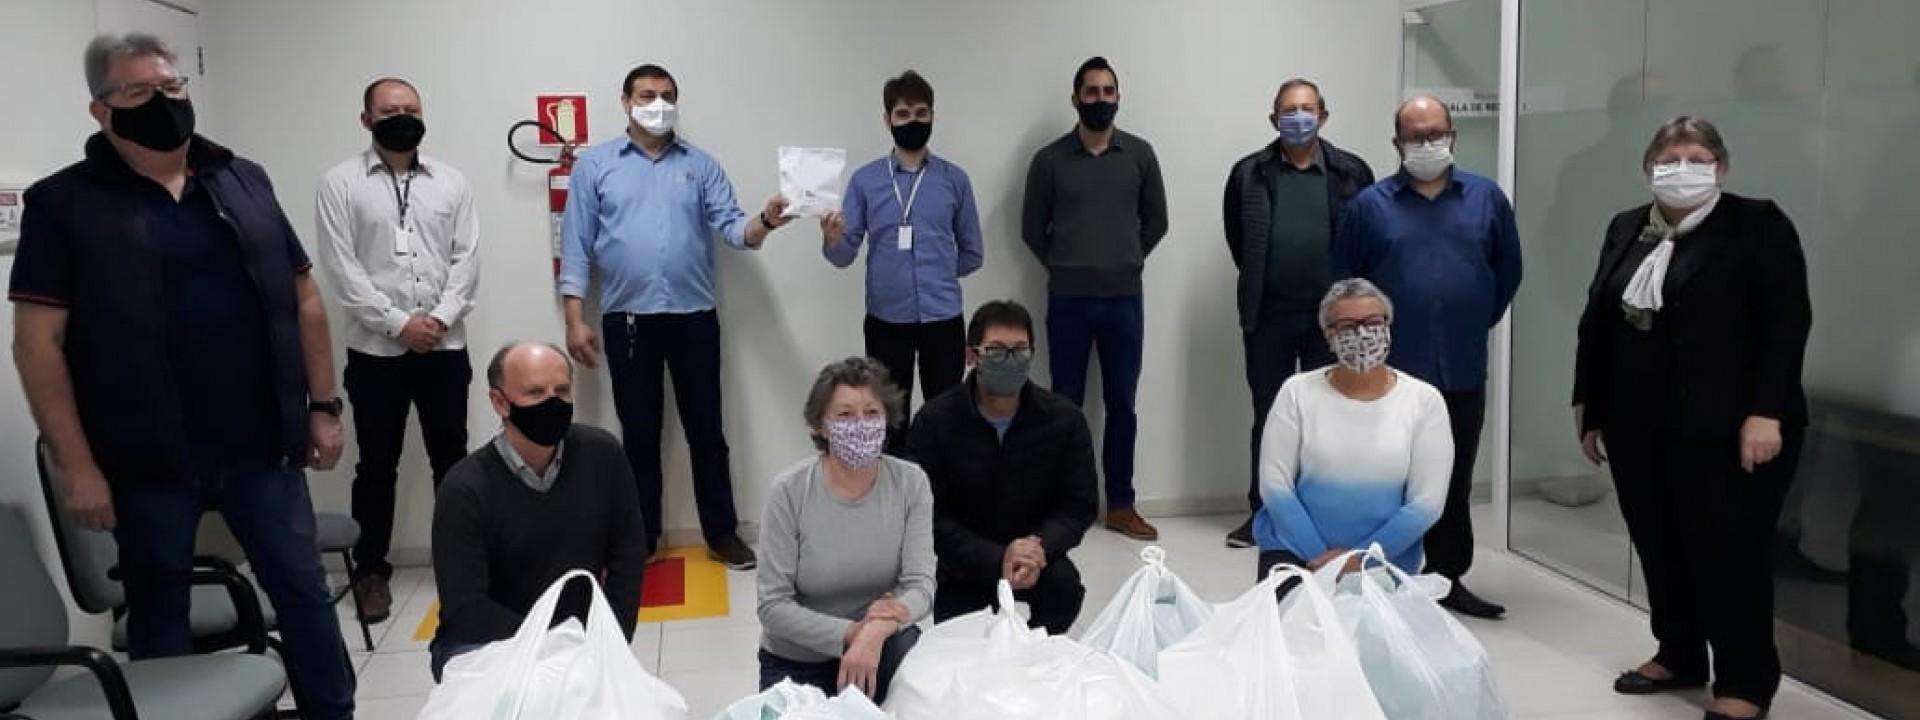 campanha-solidaria-ao-hospital-beneficente-sao-pedro_10_3585.jpg